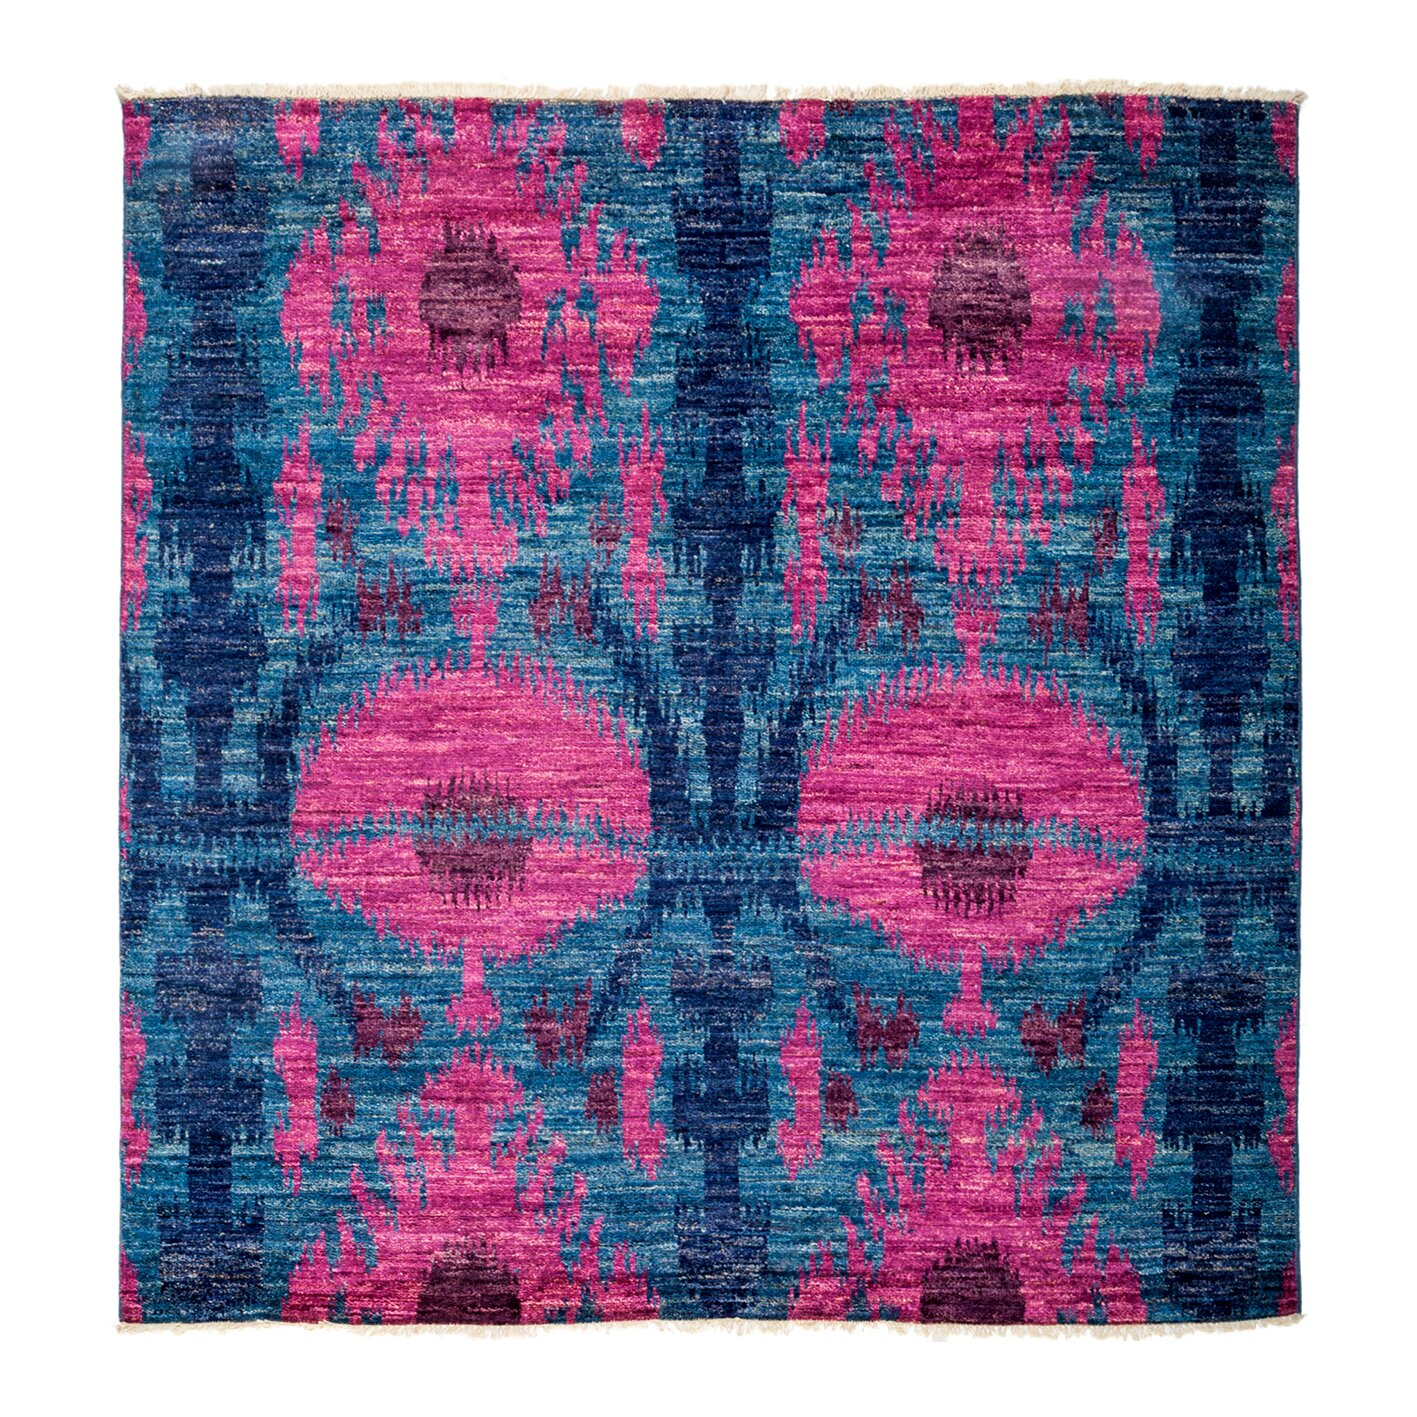 darya rugs ikat hand knotted blue pink area rug. Black Bedroom Furniture Sets. Home Design Ideas